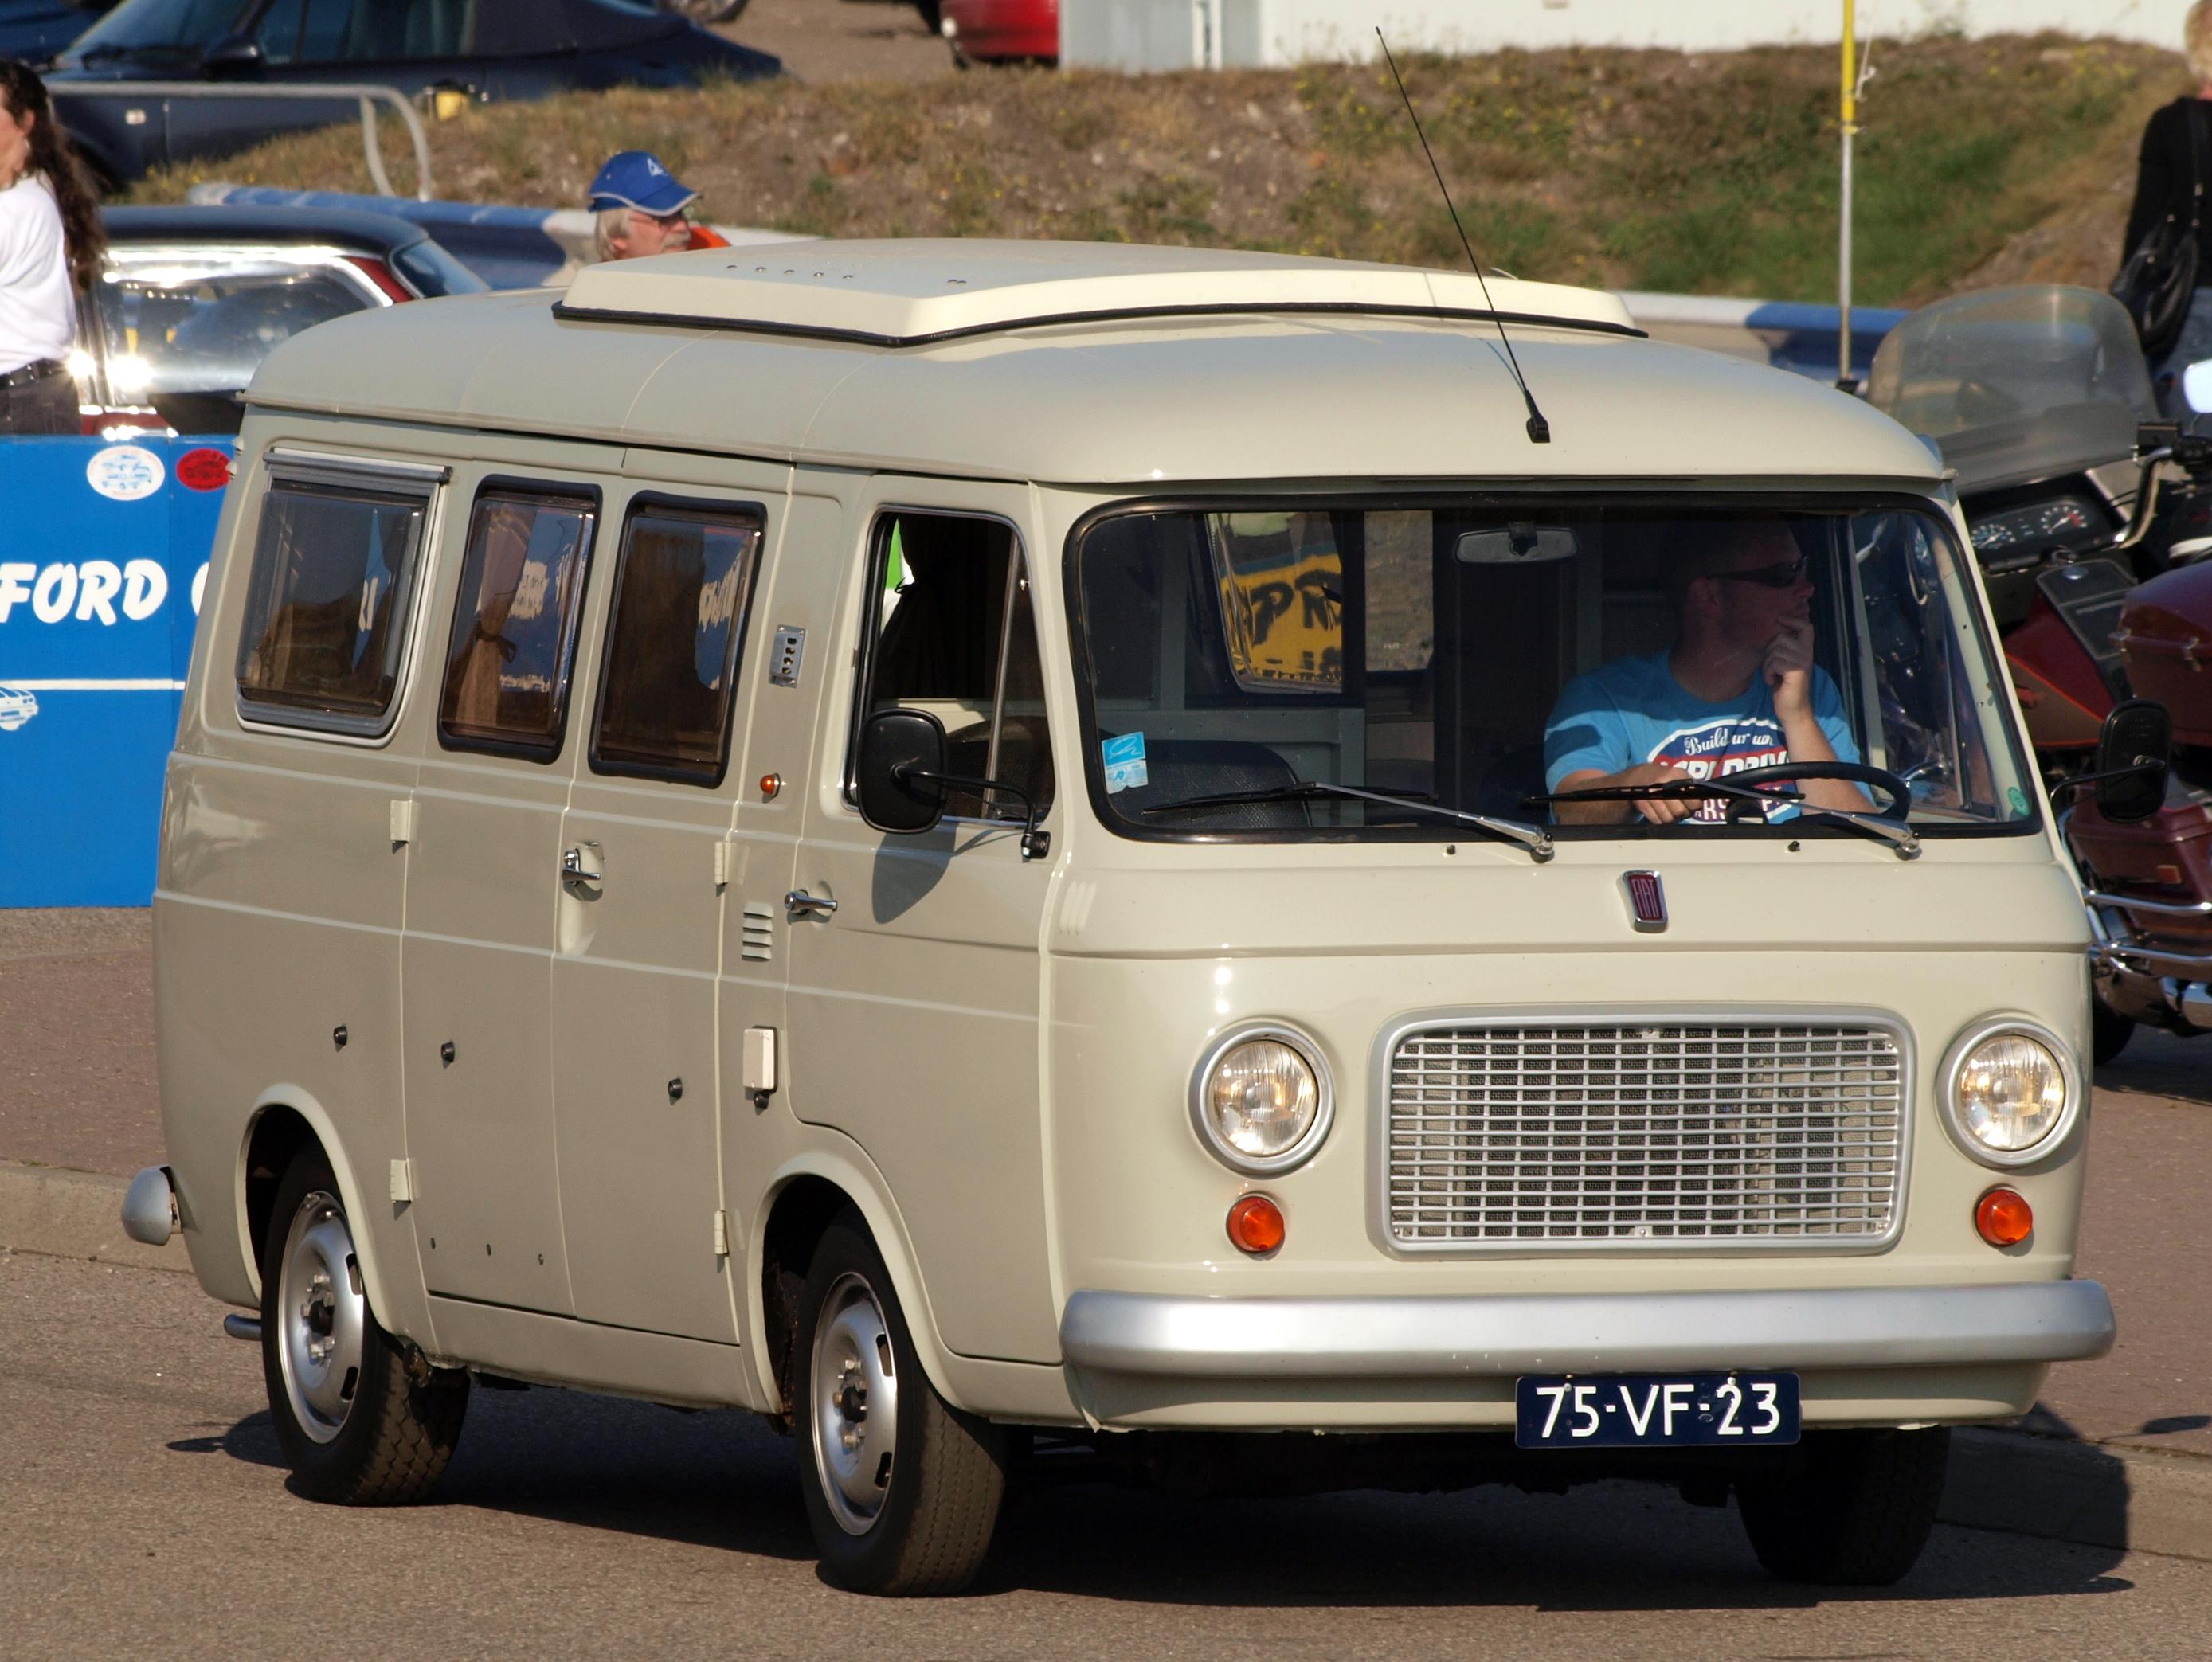 File:Fiat 238 dutch licence registration 75-VF-23 pic01.jpg